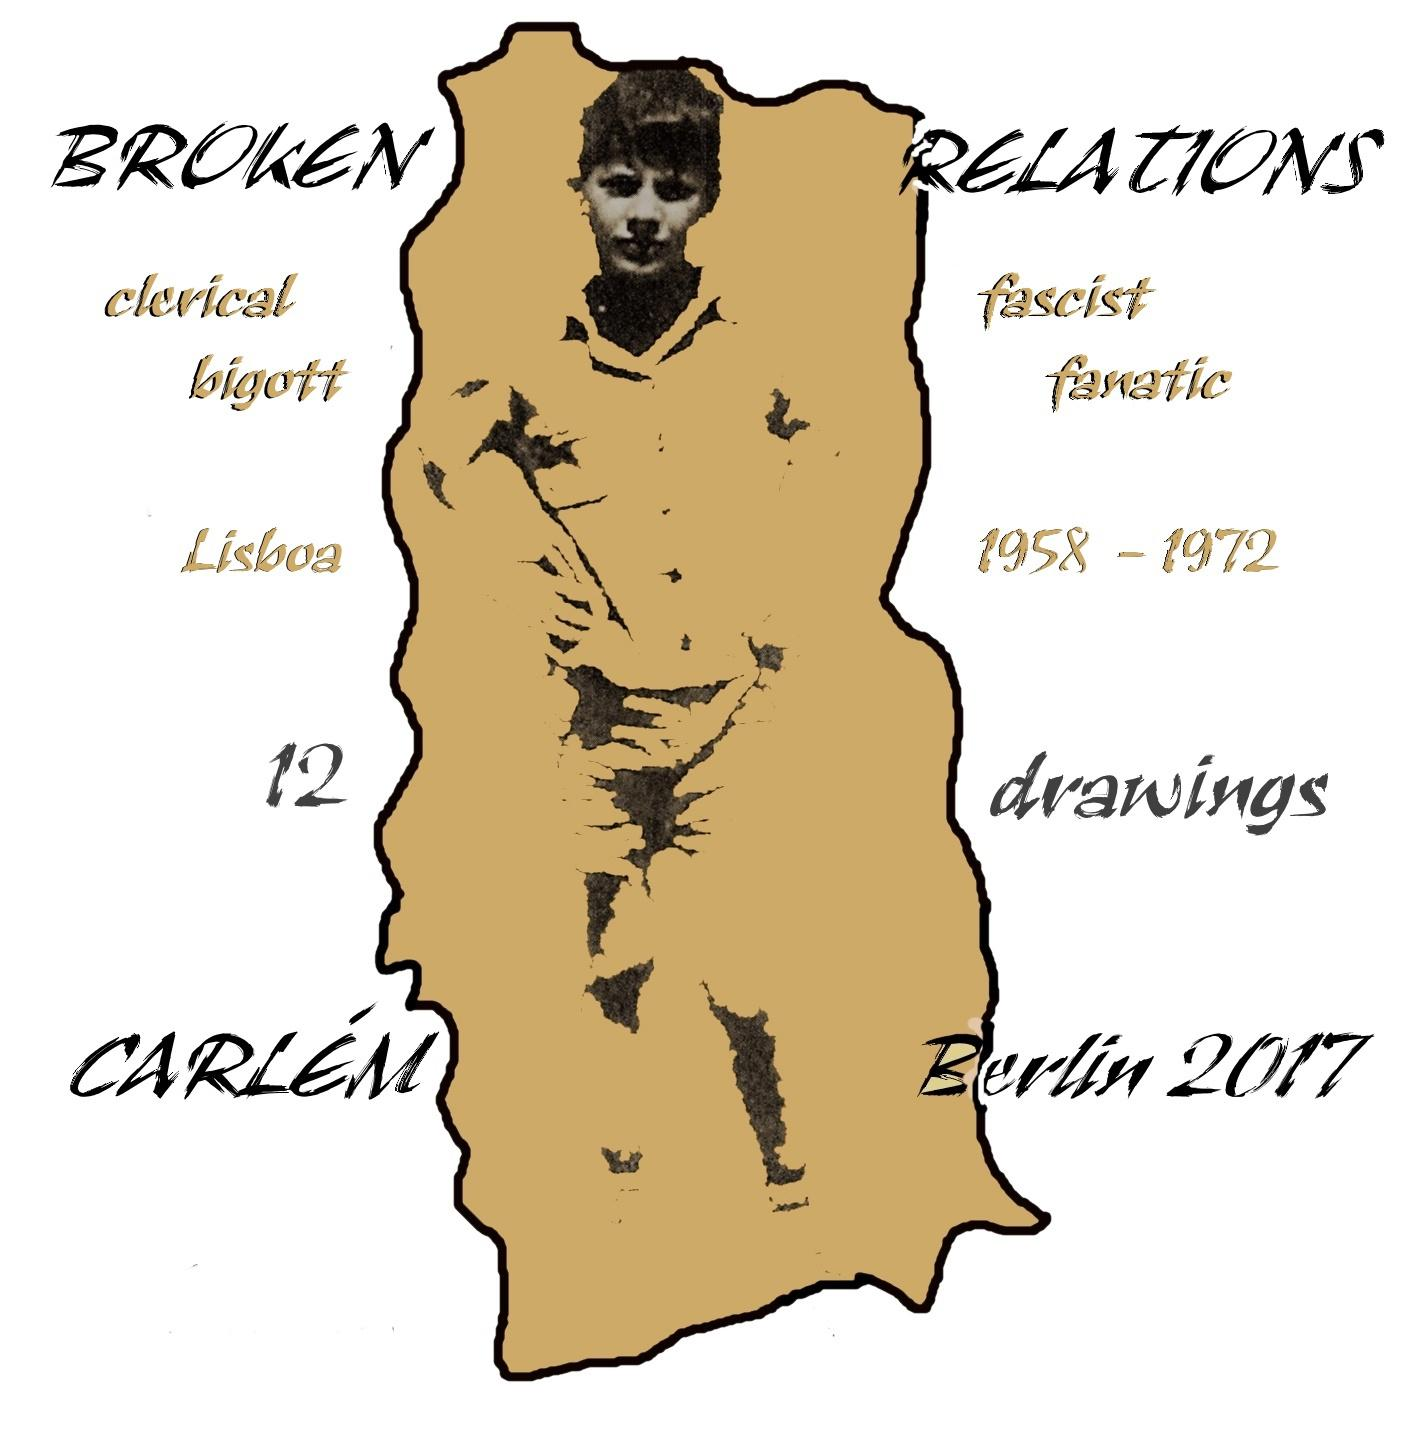 broken relations - carlém